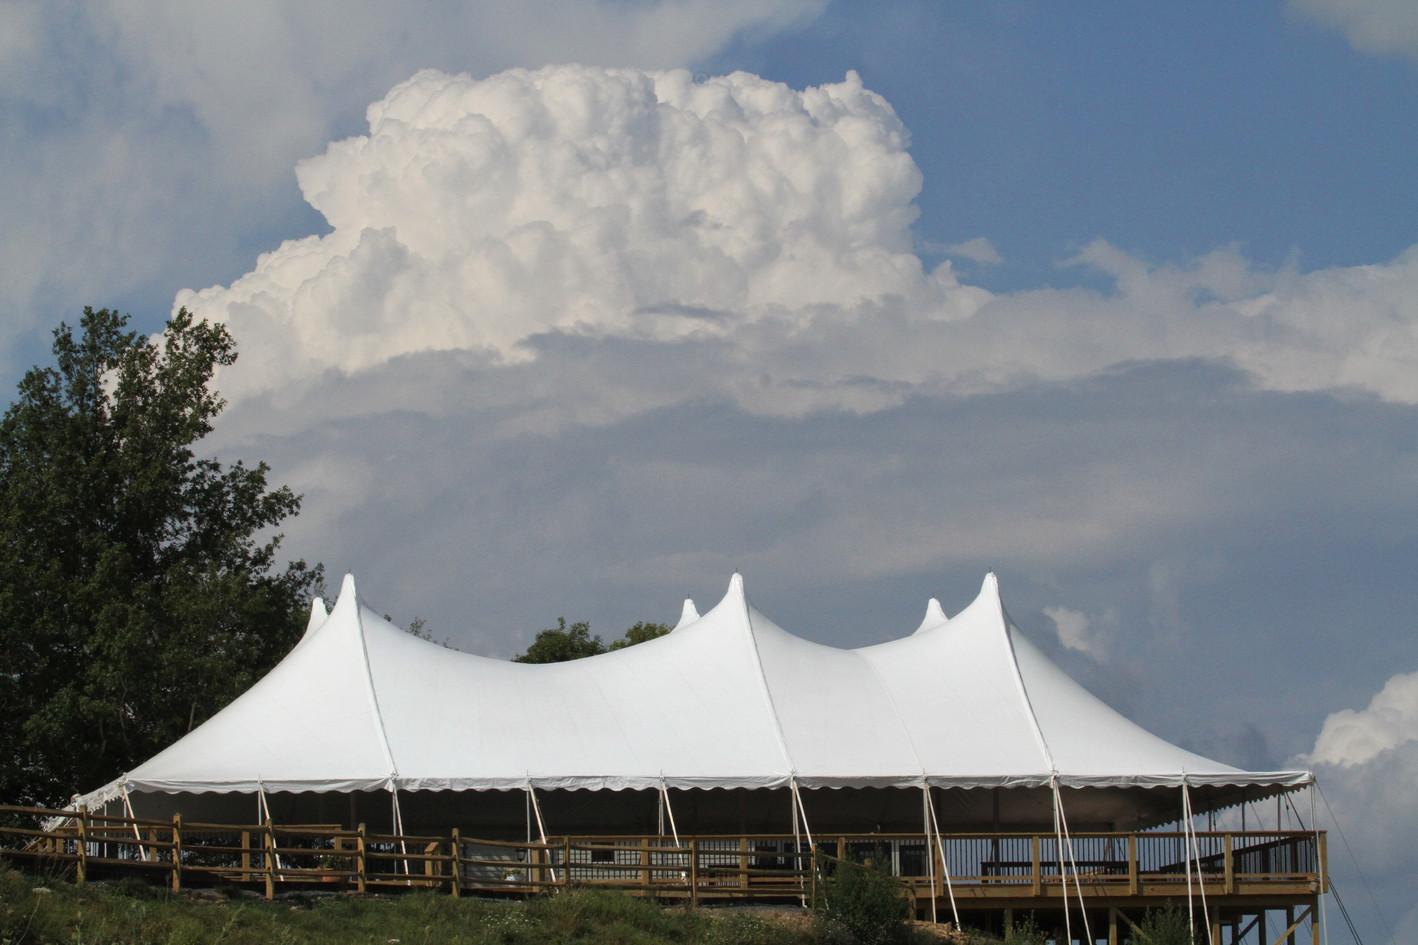 Tent Cloud.JPG